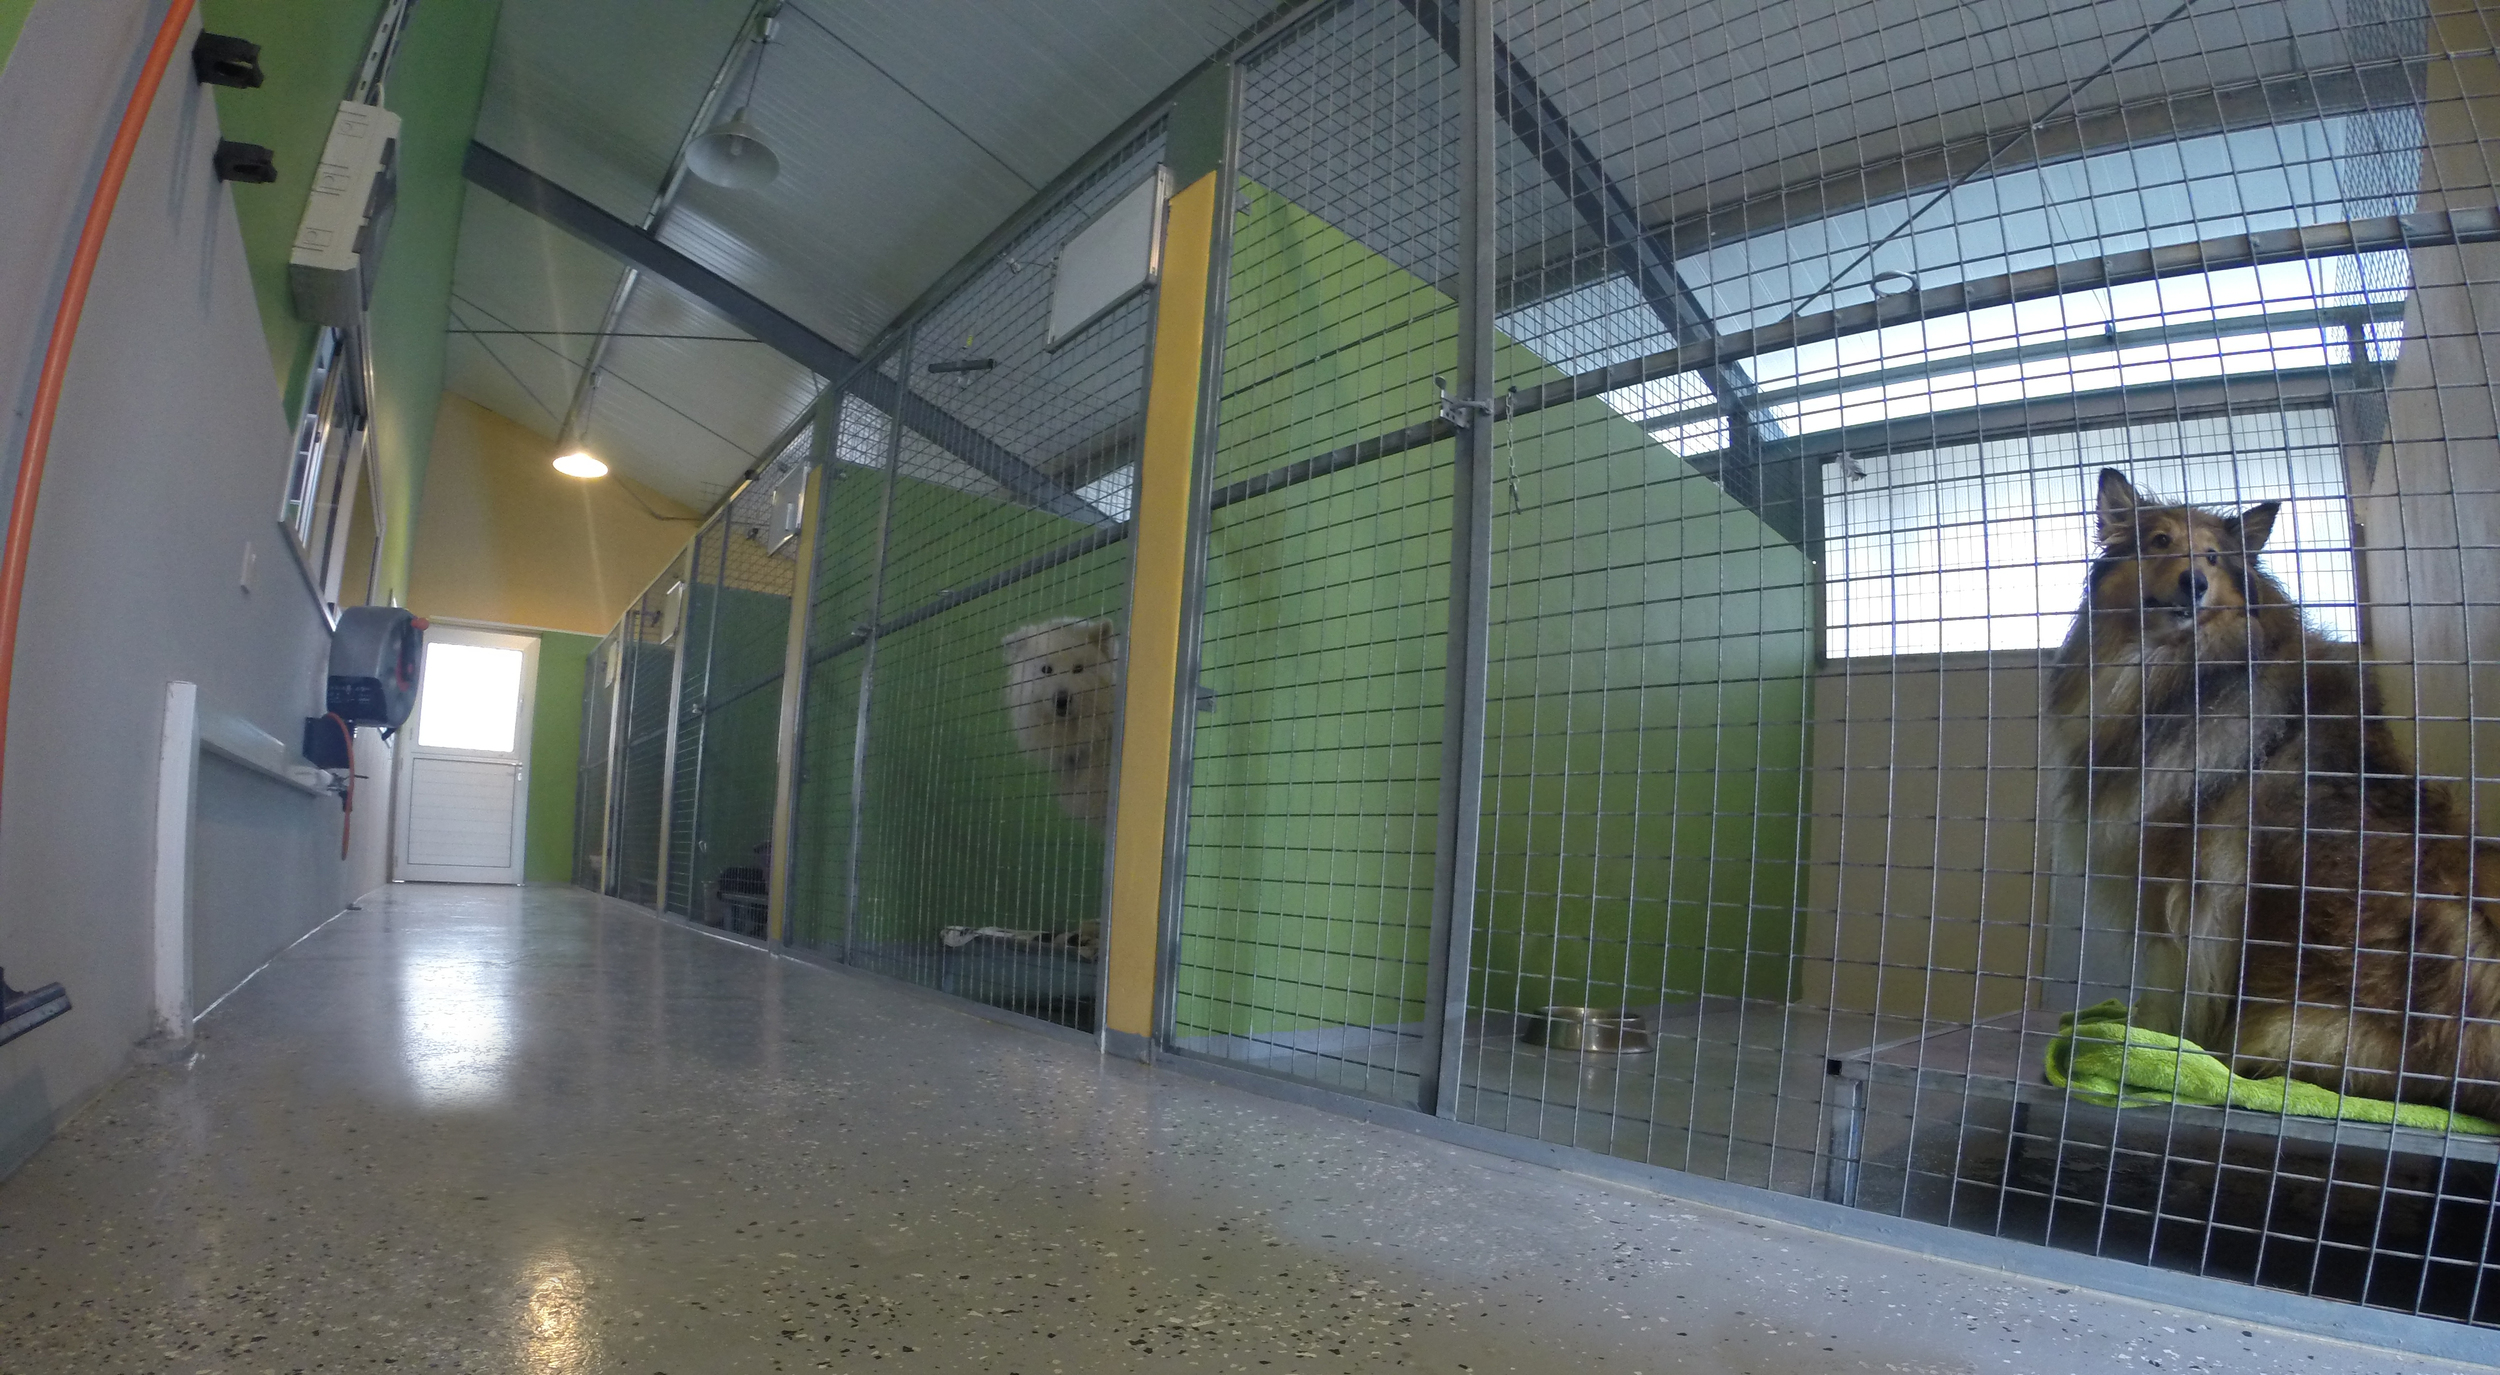 Dog Ranch | Cyprus Dog Hotel | Indoor Boarding Kennels